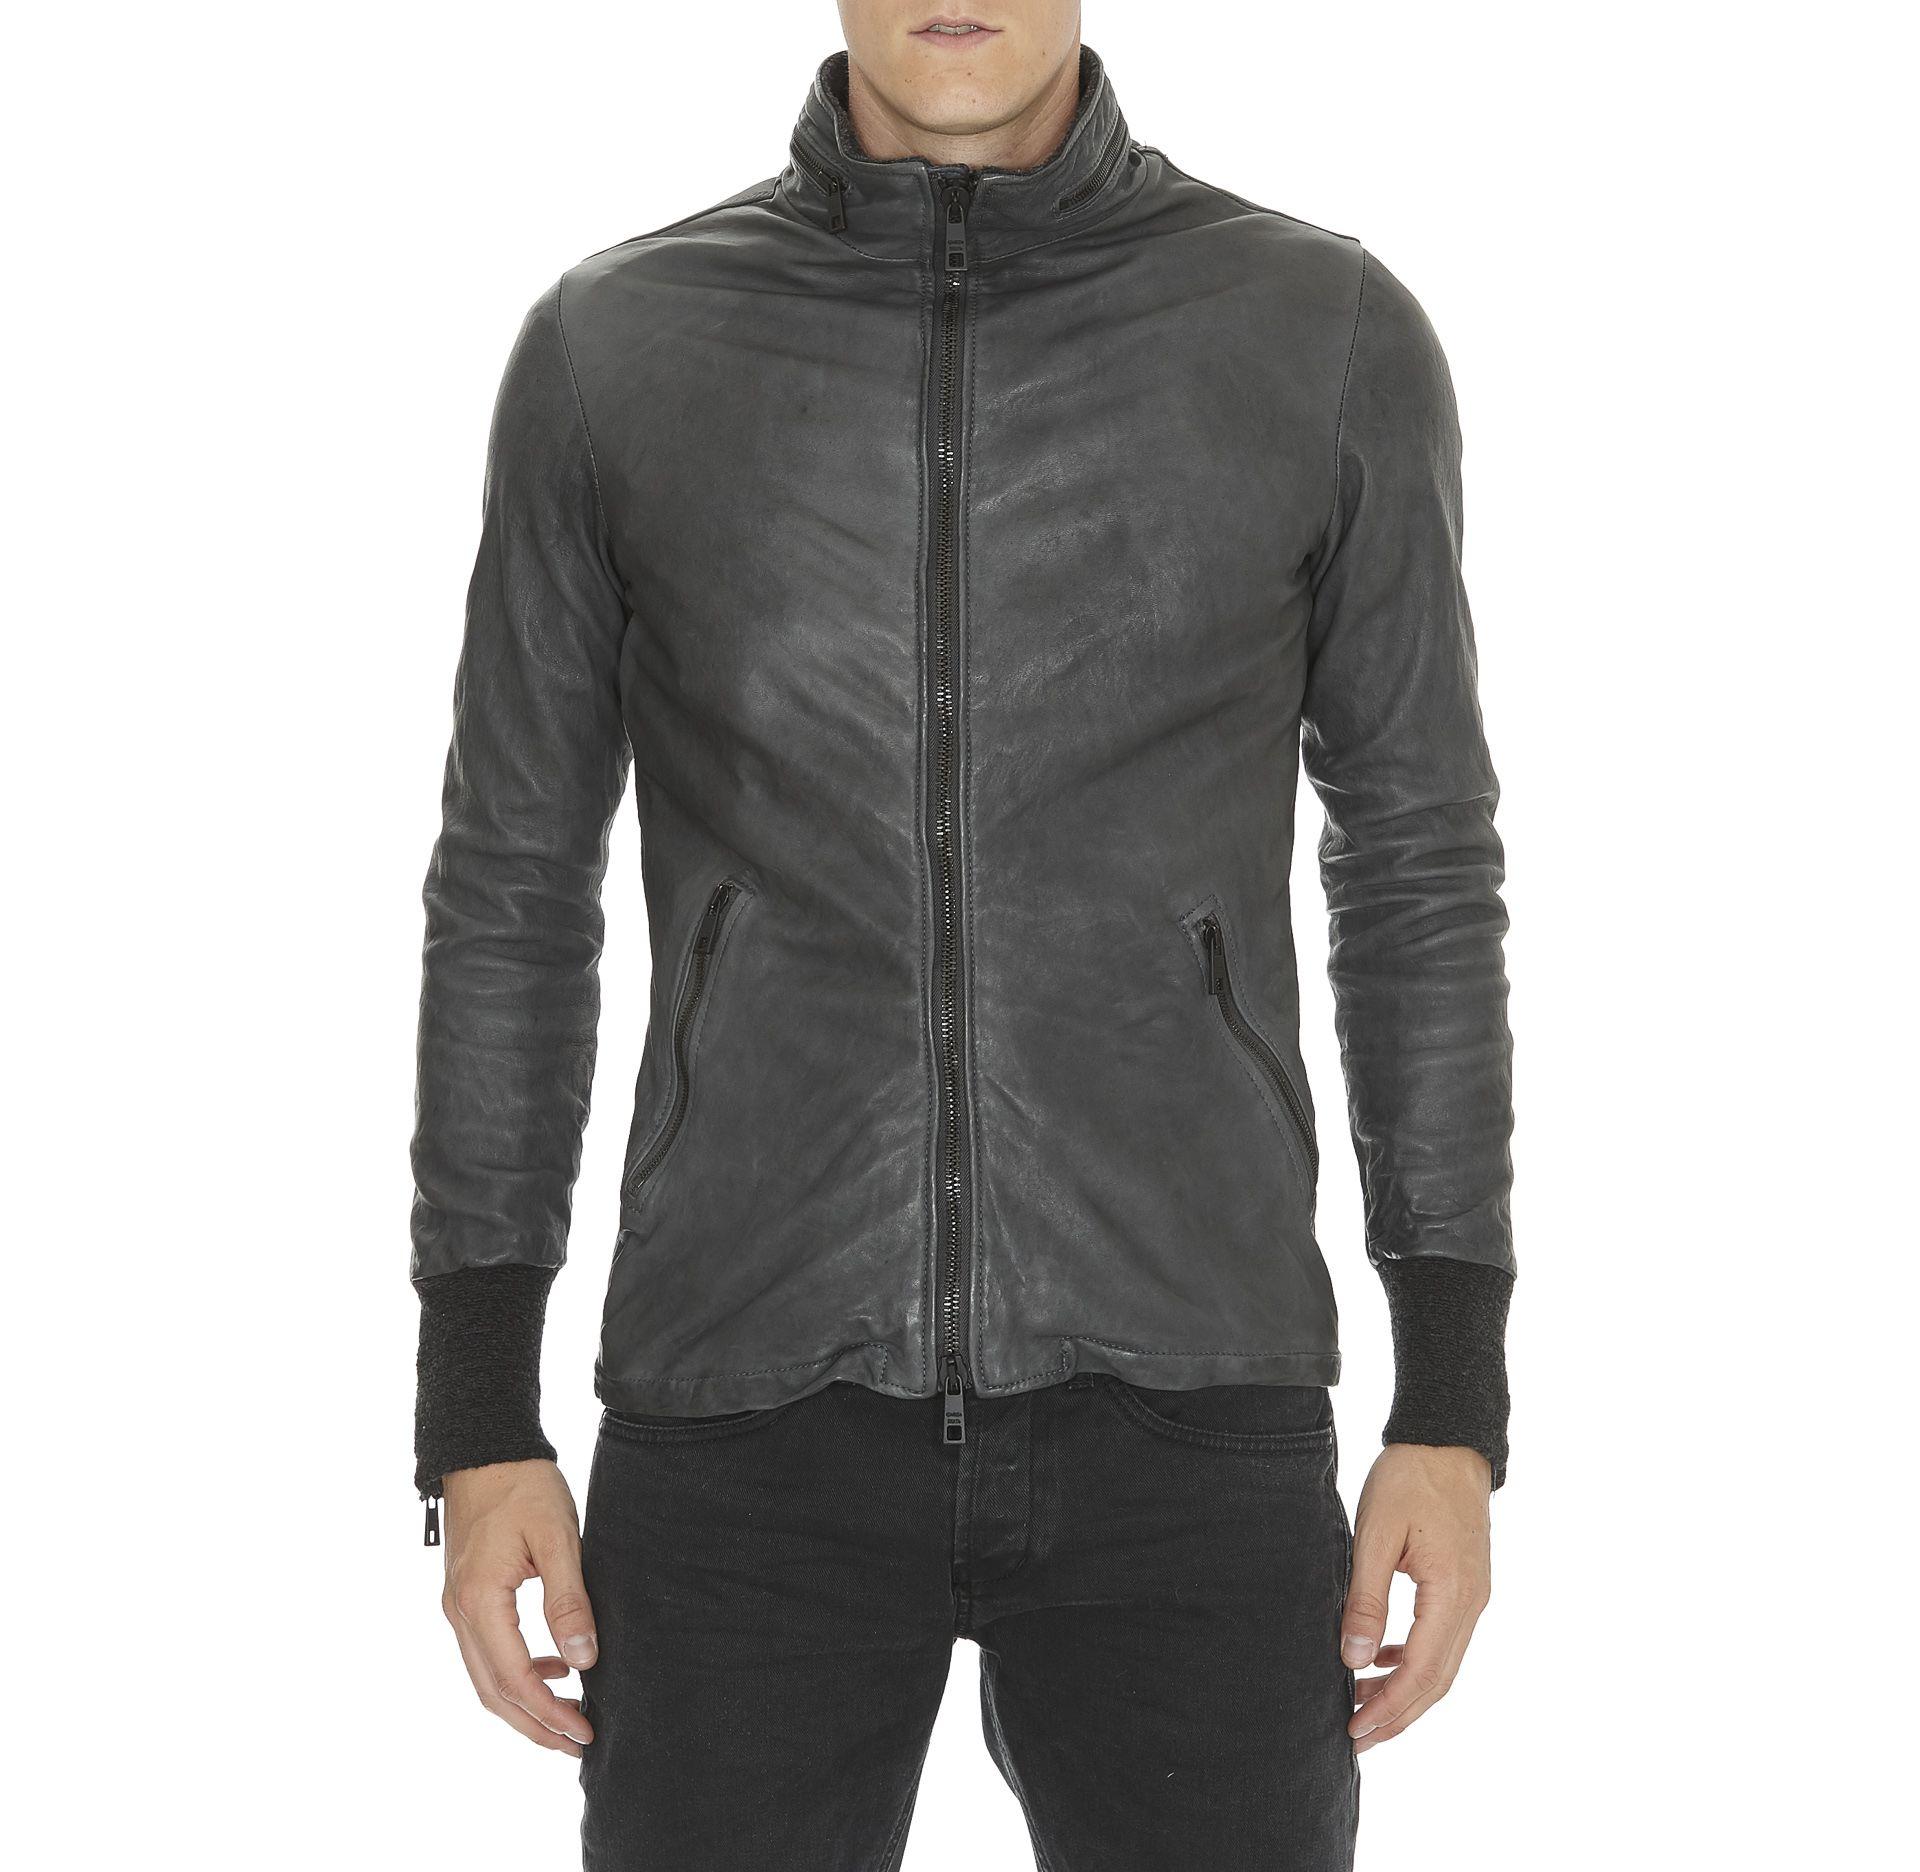 Giorgio Brato Tornado Leather Jacket